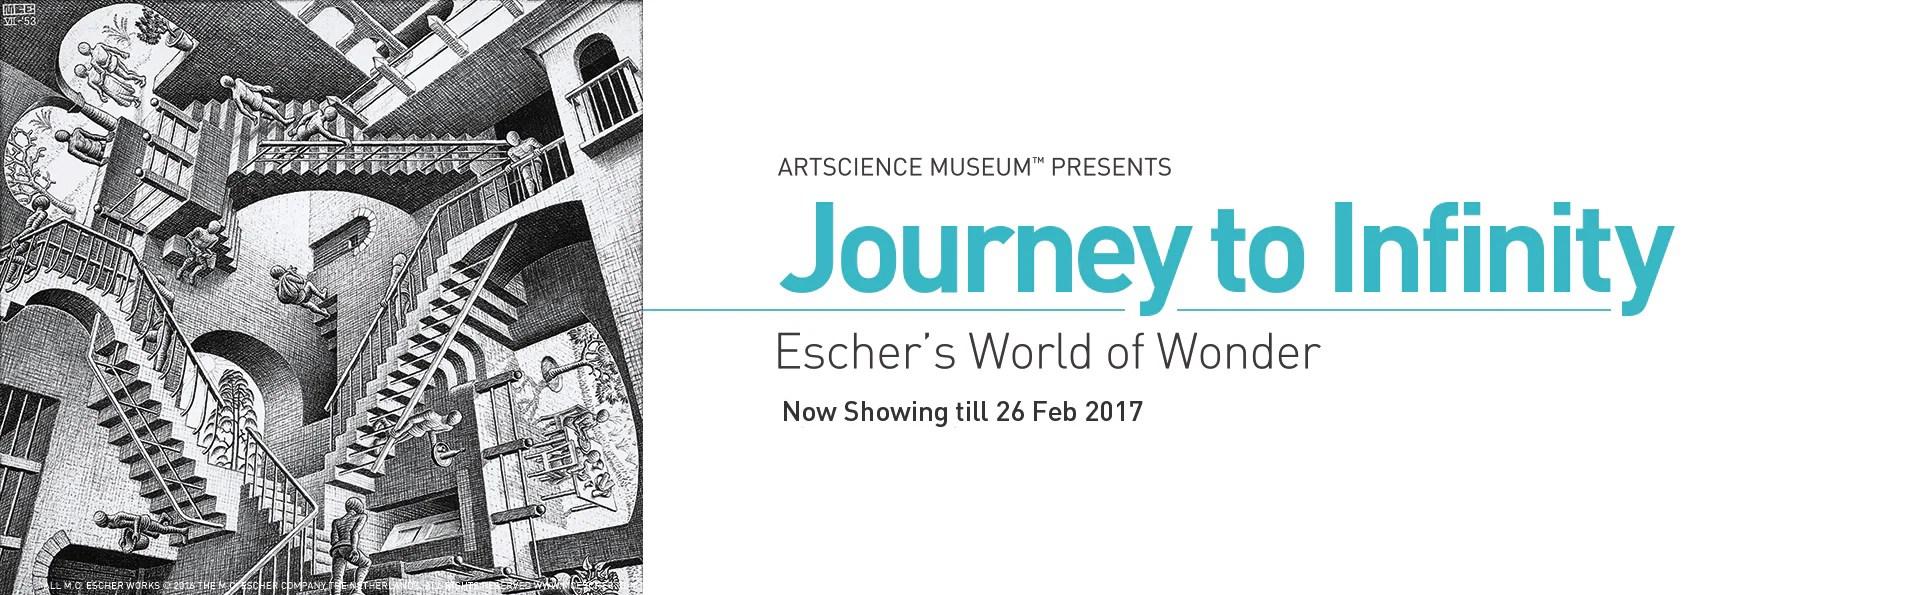 M.C.Escher exhibition at ArtScience Museum